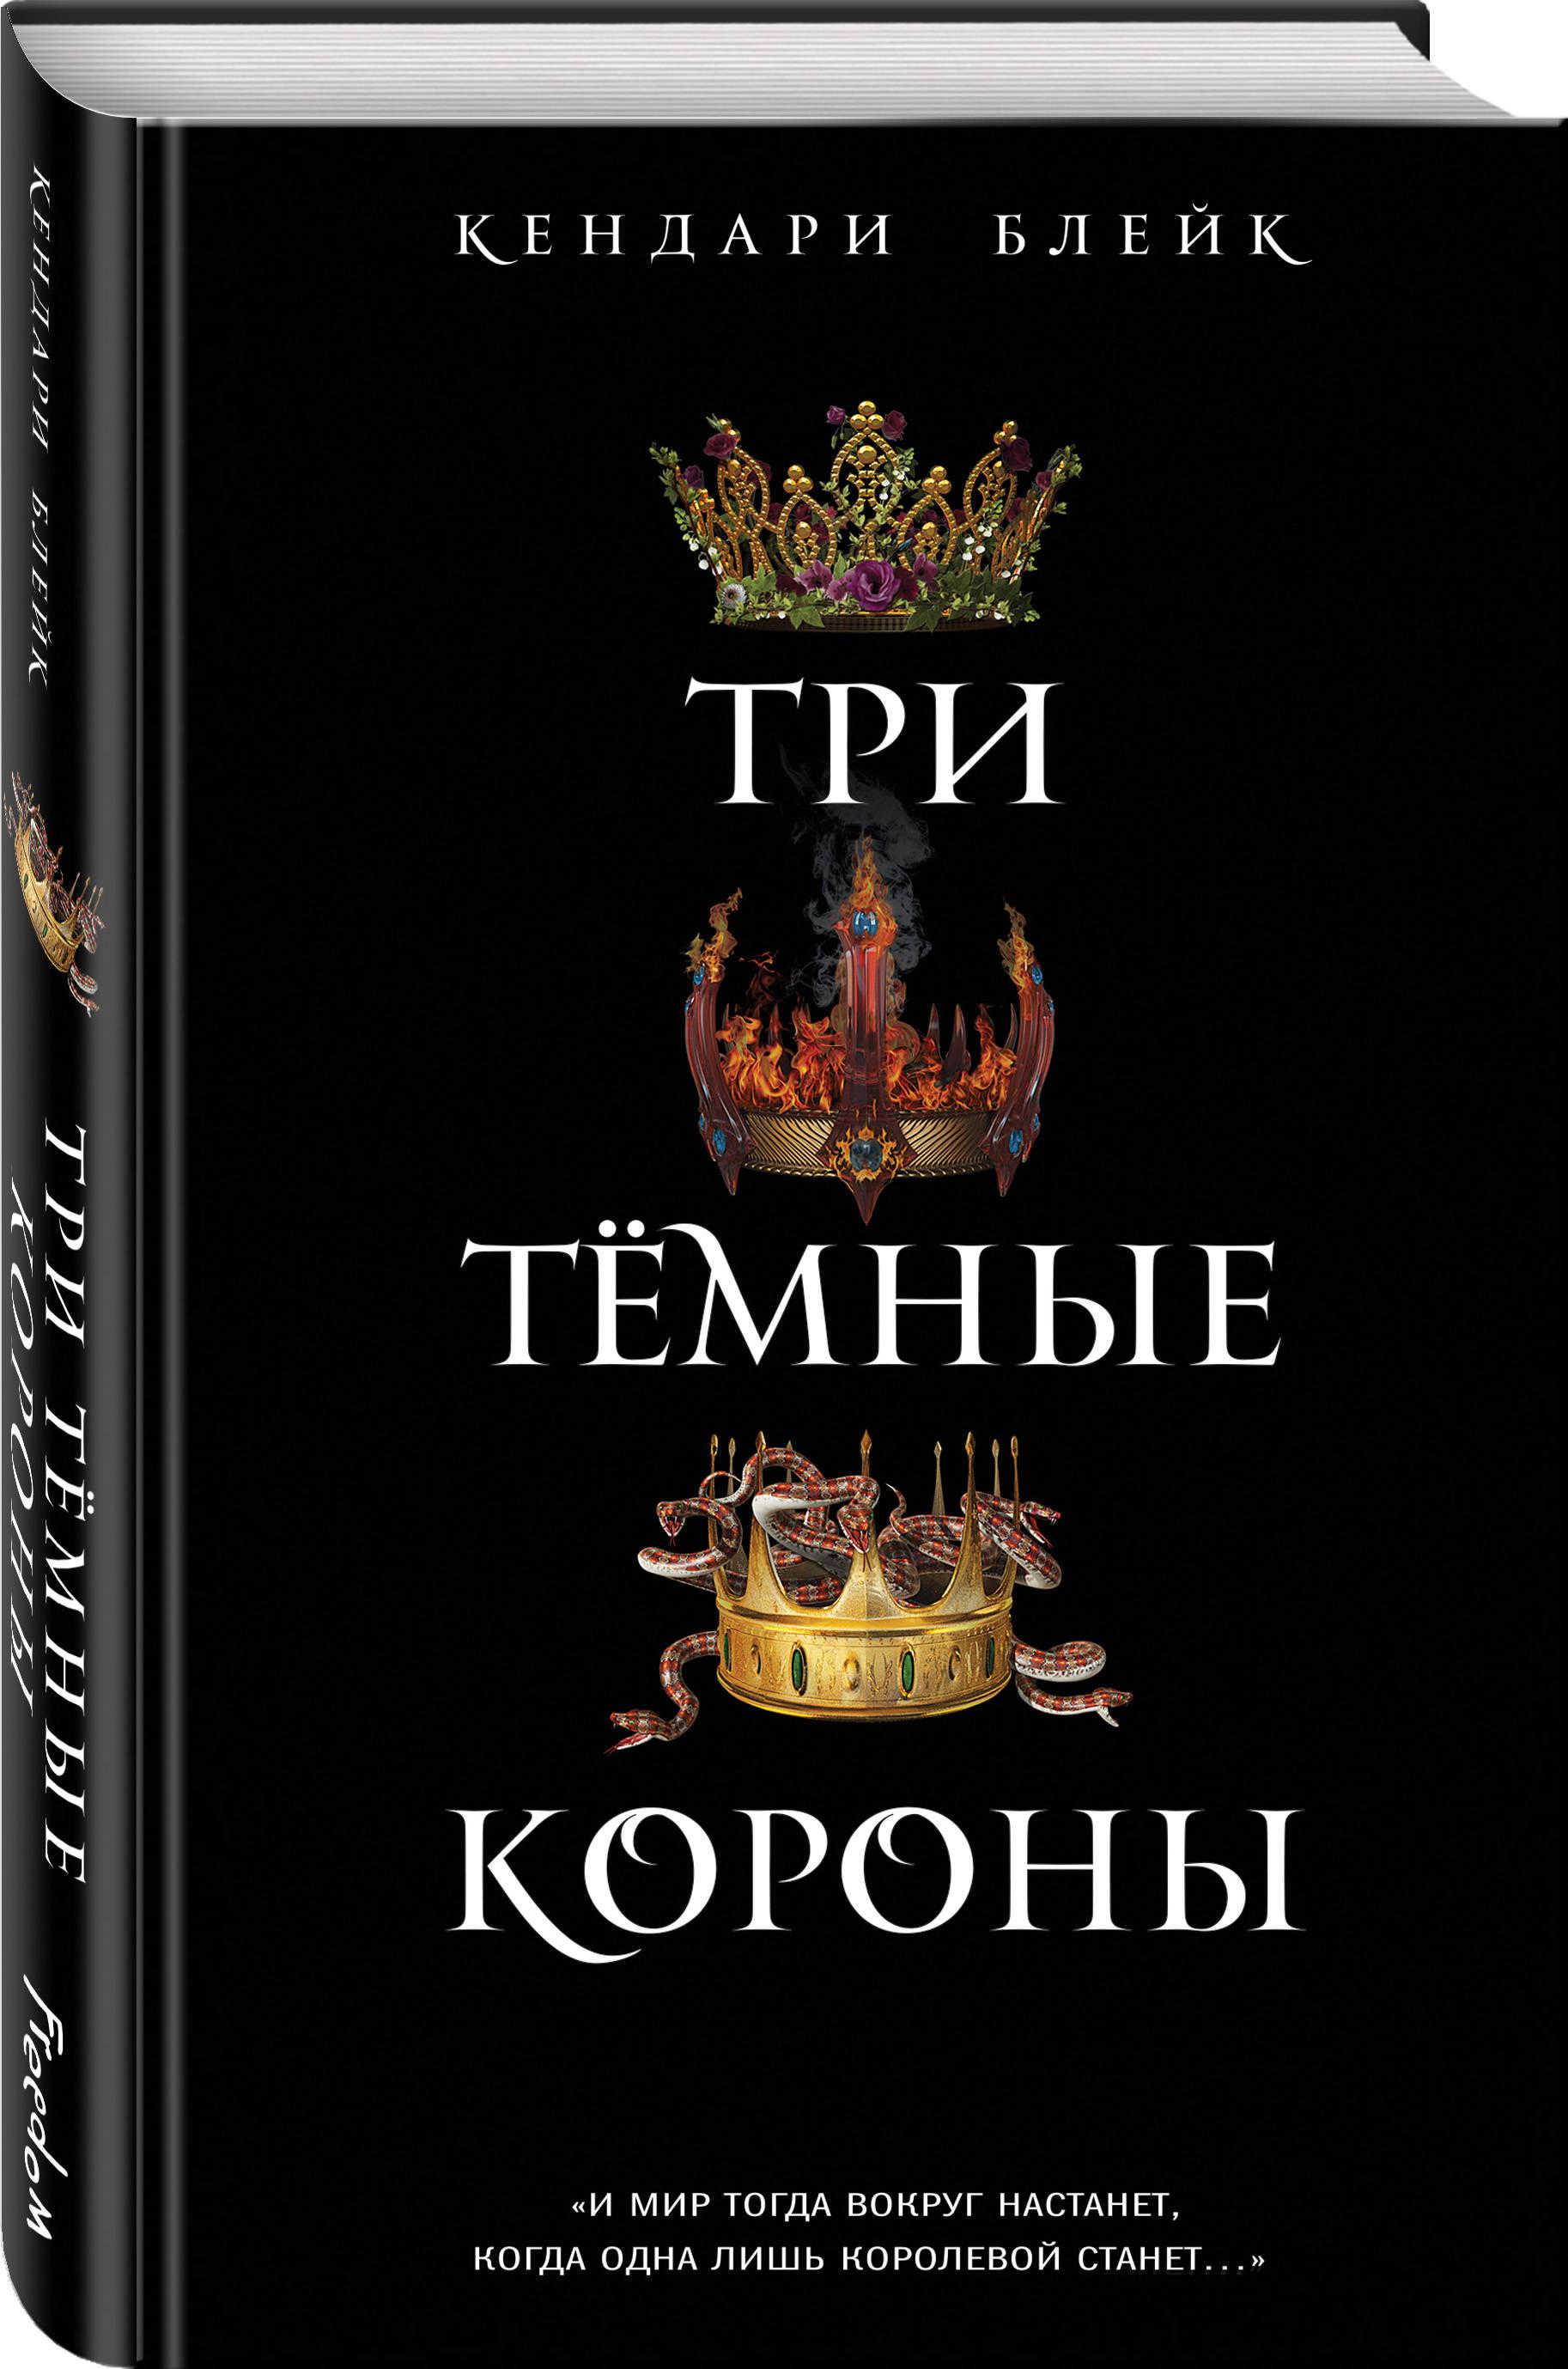 Кендари Блейк Три темные короны (#1)